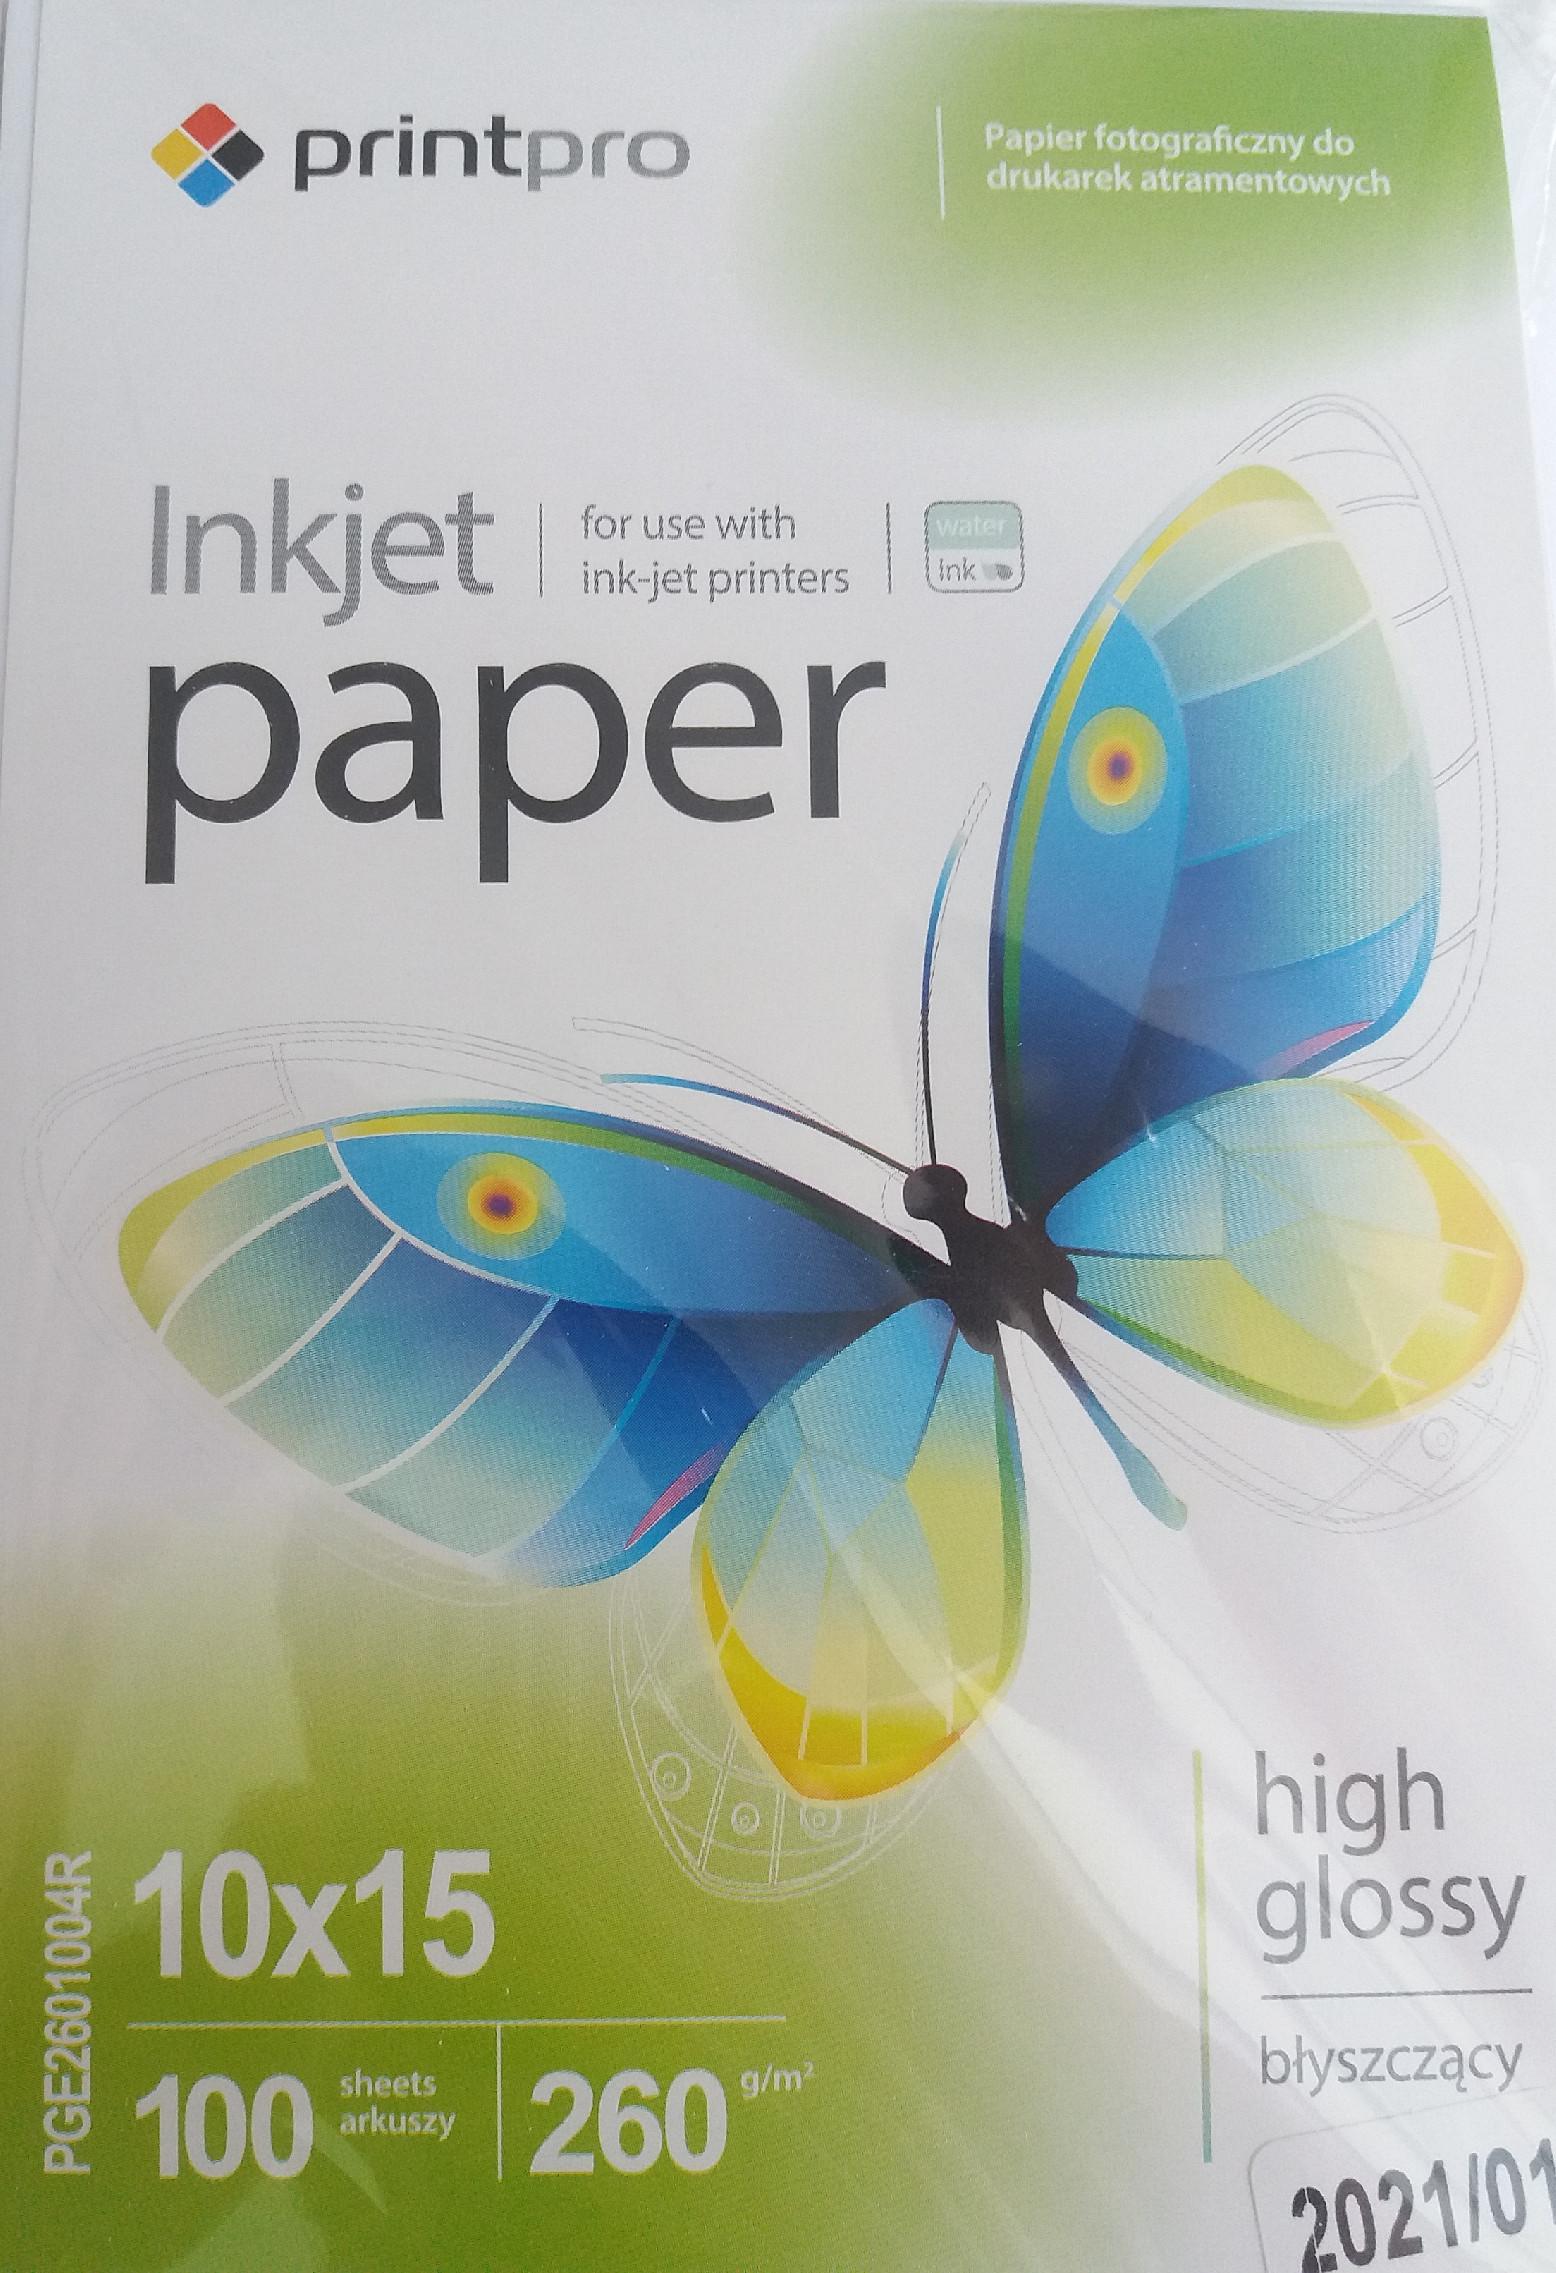 PrintPro Fotopapier PP Vysoko lesklý 260g/m²,100ks,10x15